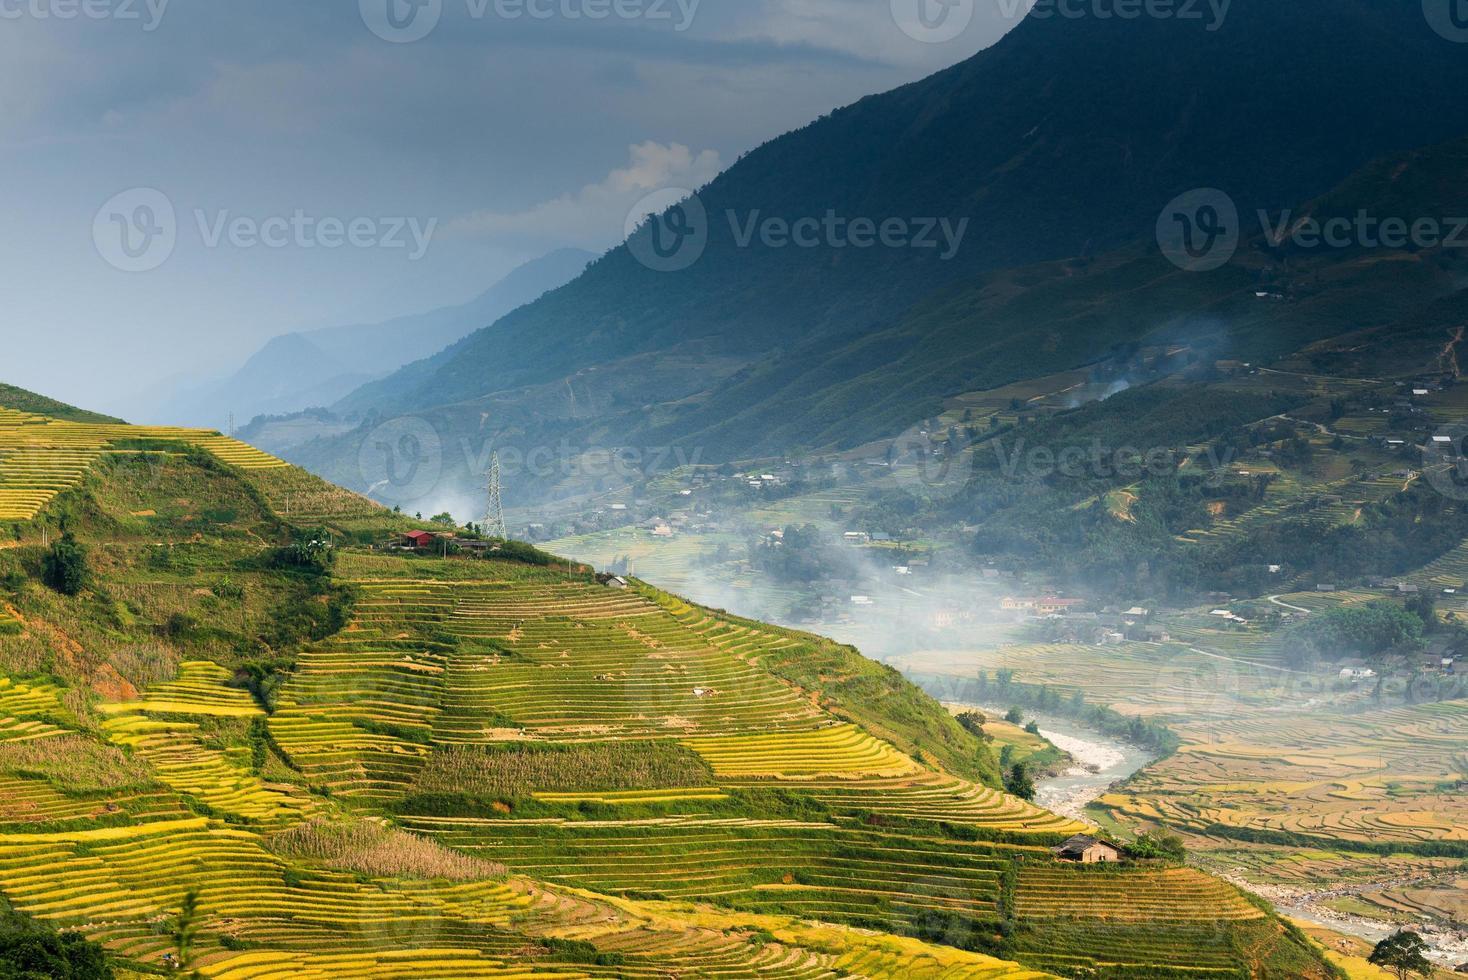 bella terrazza di riso a sapa, vietnam foto